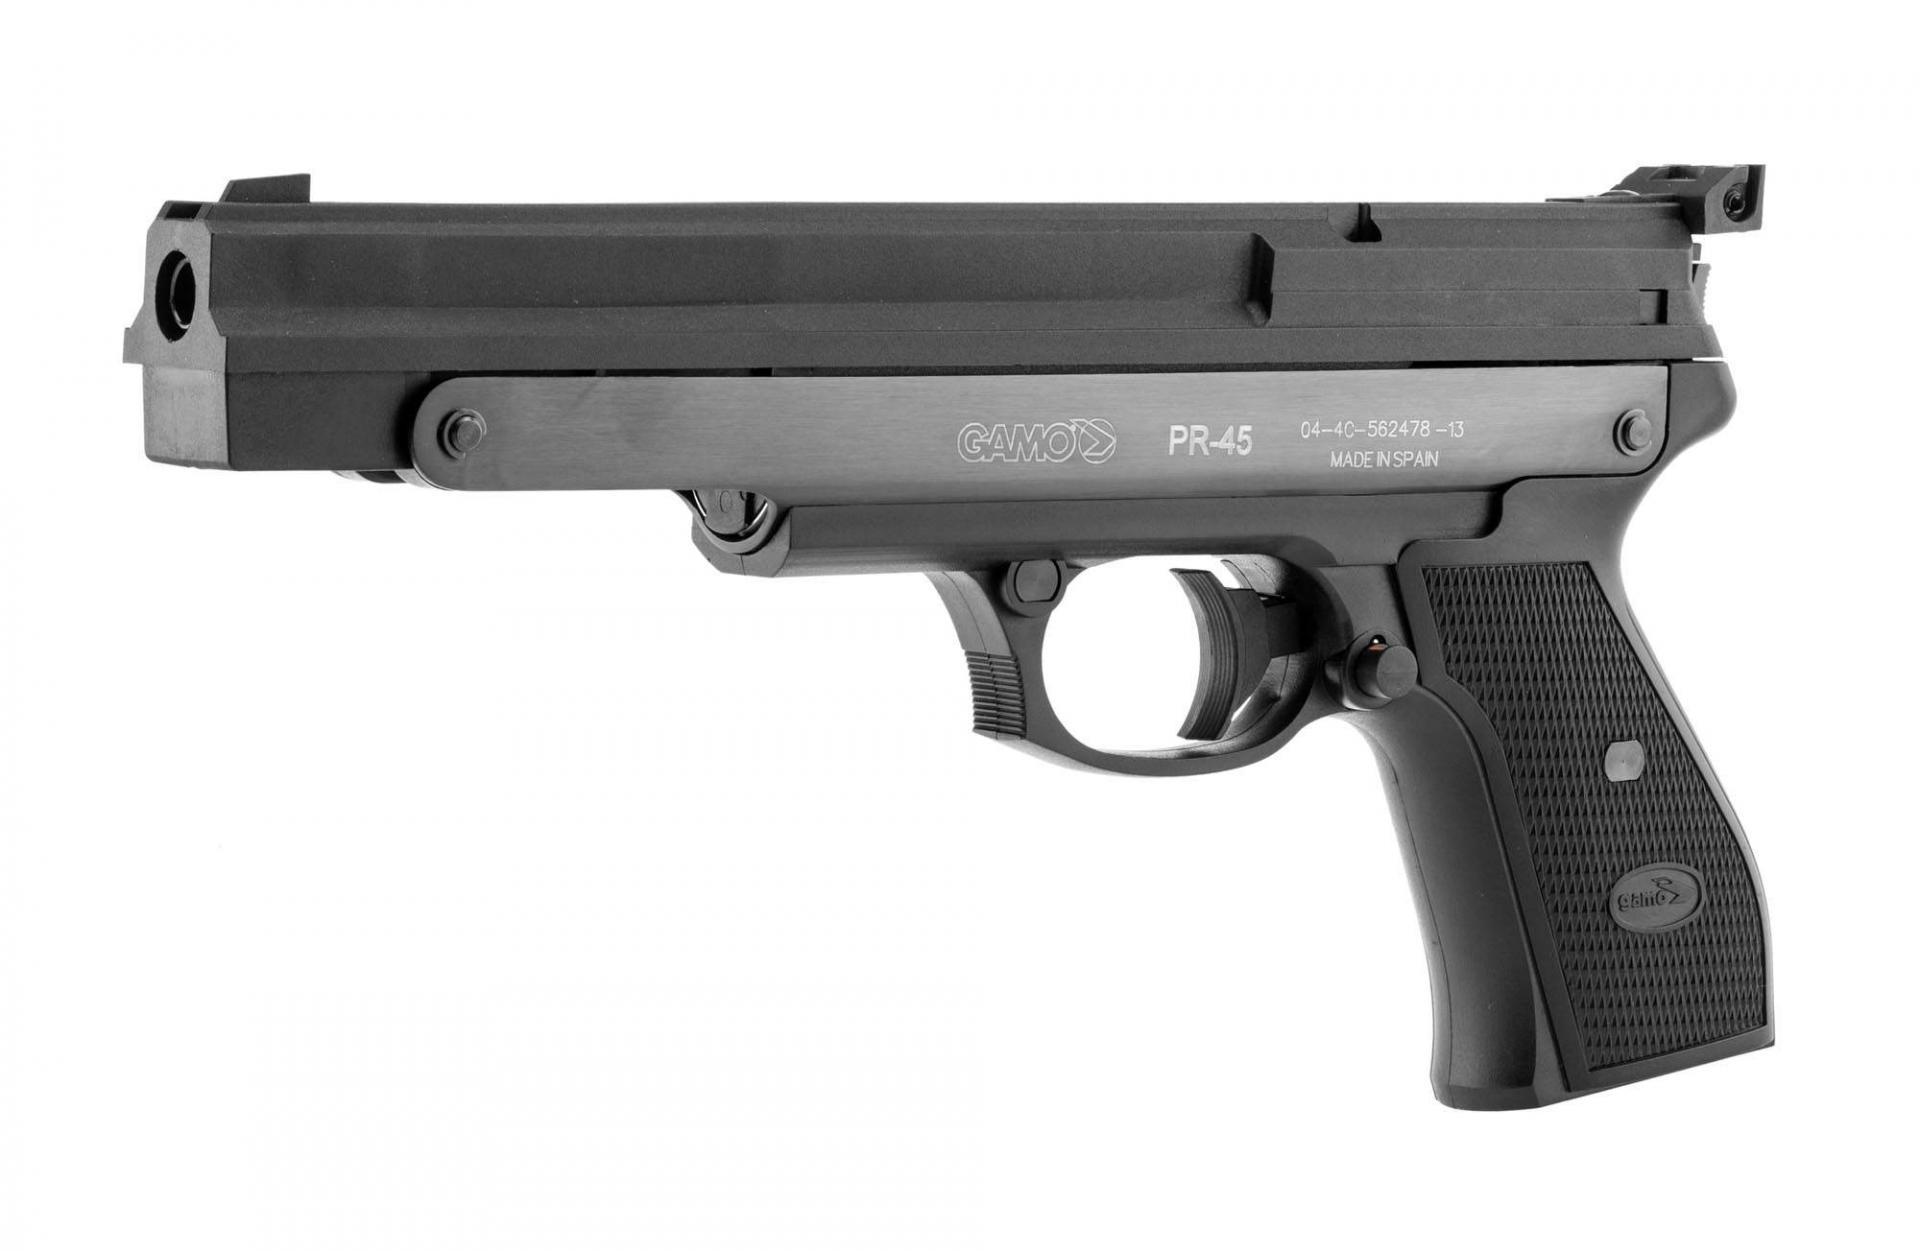 Pistolet Gamo PR-45 Cal.4.5mm